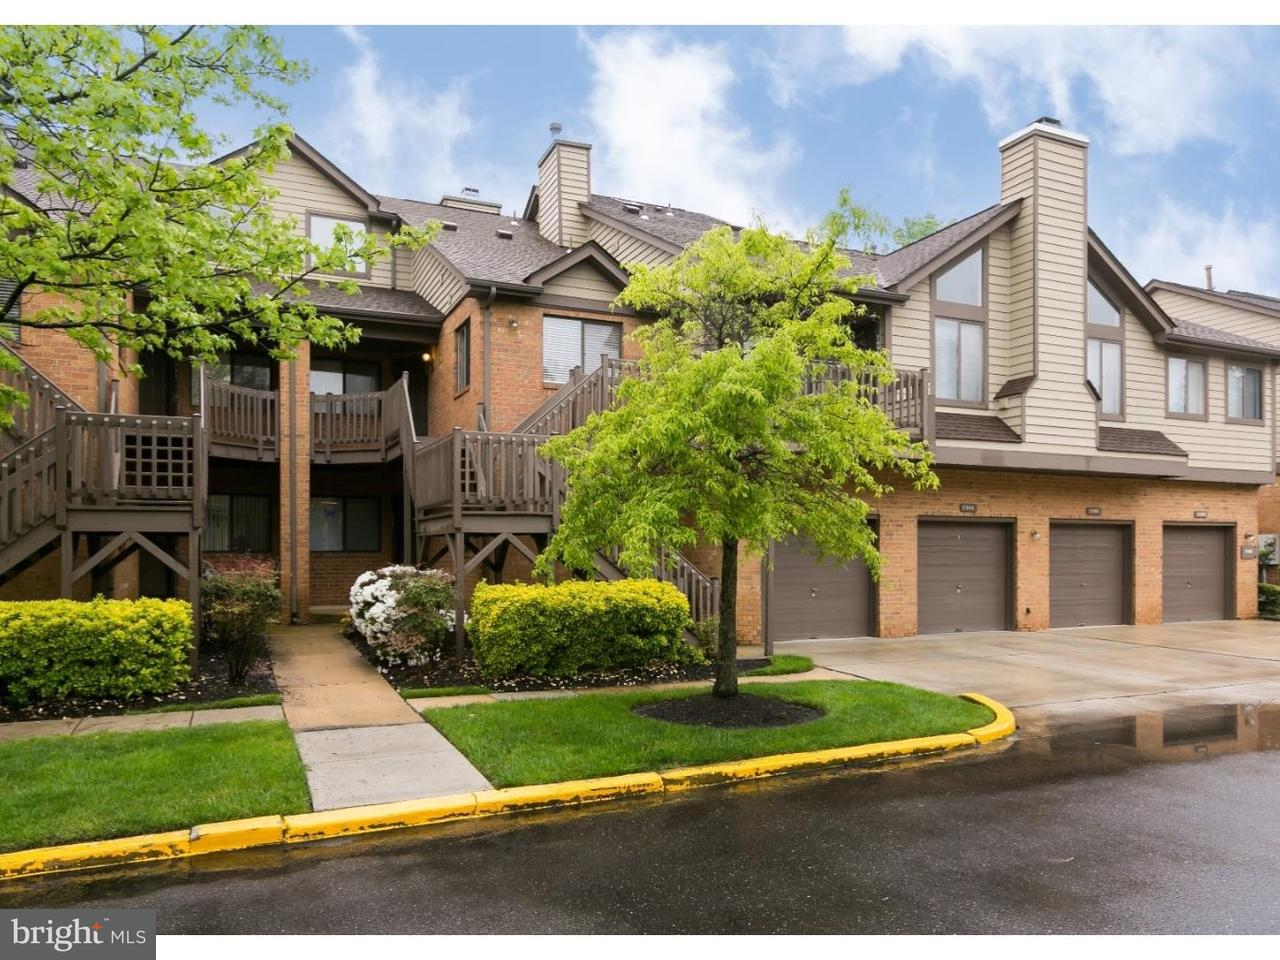 Condominium for Sale at 2004 AUGUSTA Circle Mount Laurel, New Jersey 08054 United States